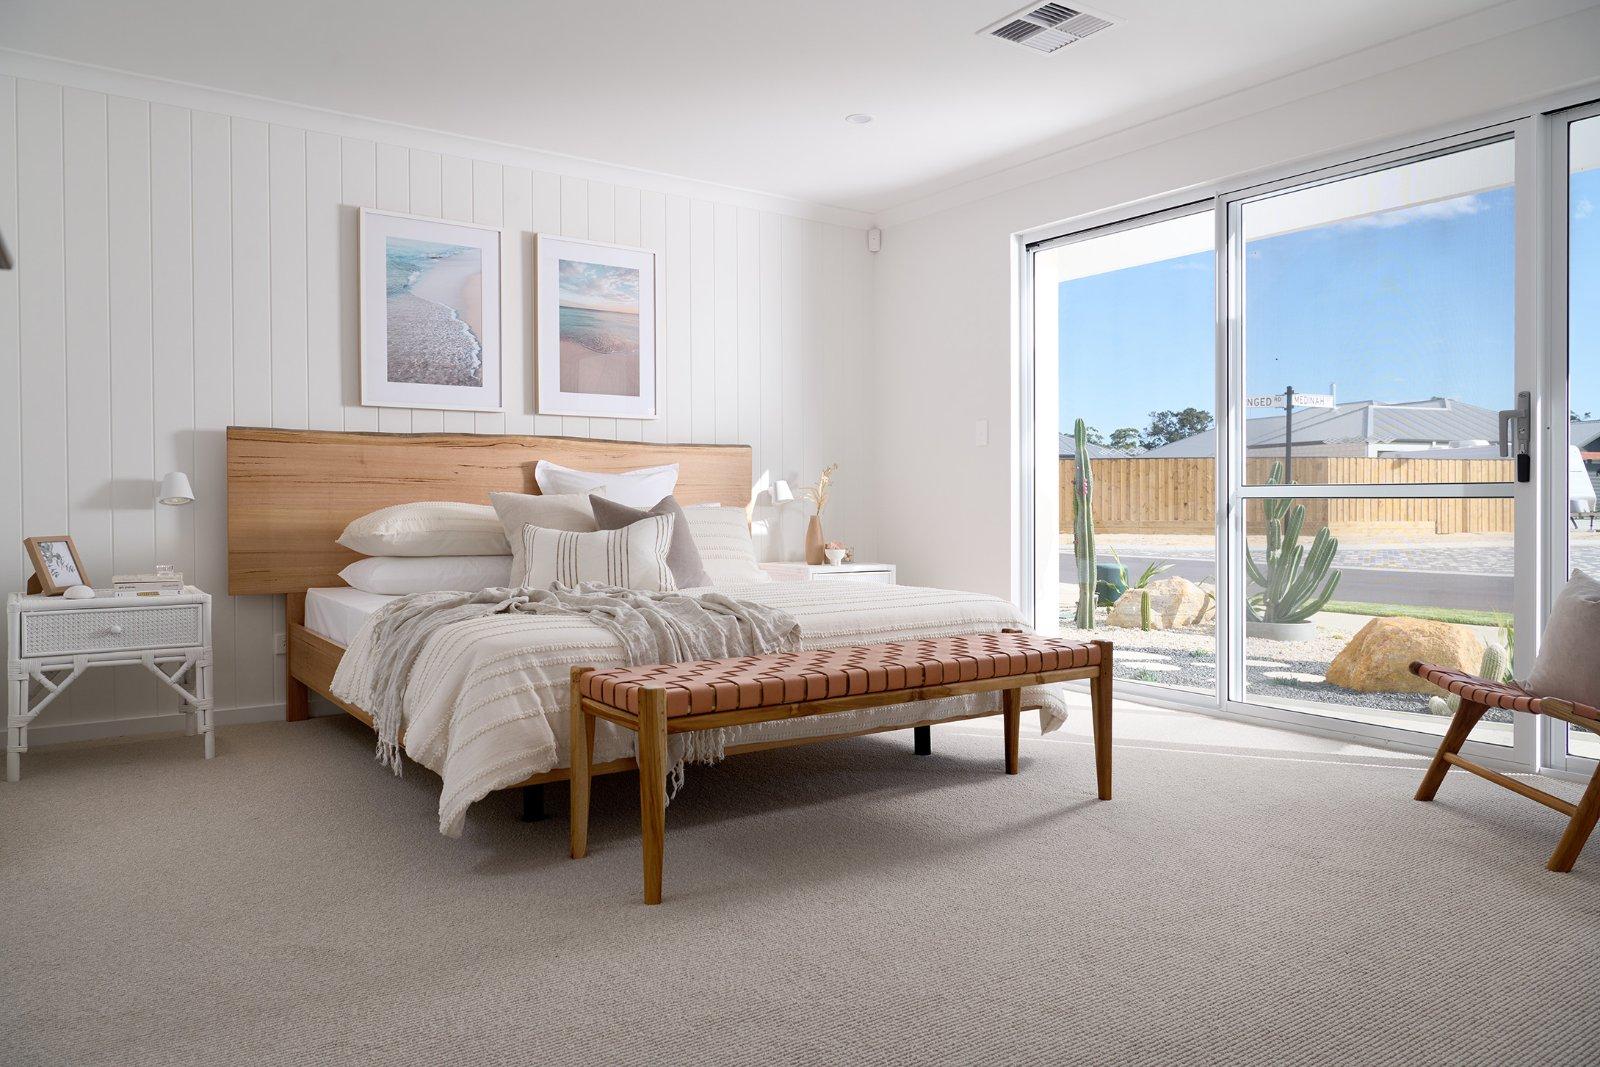 vasse-estate-house-and-land-malibu-master-bedroom